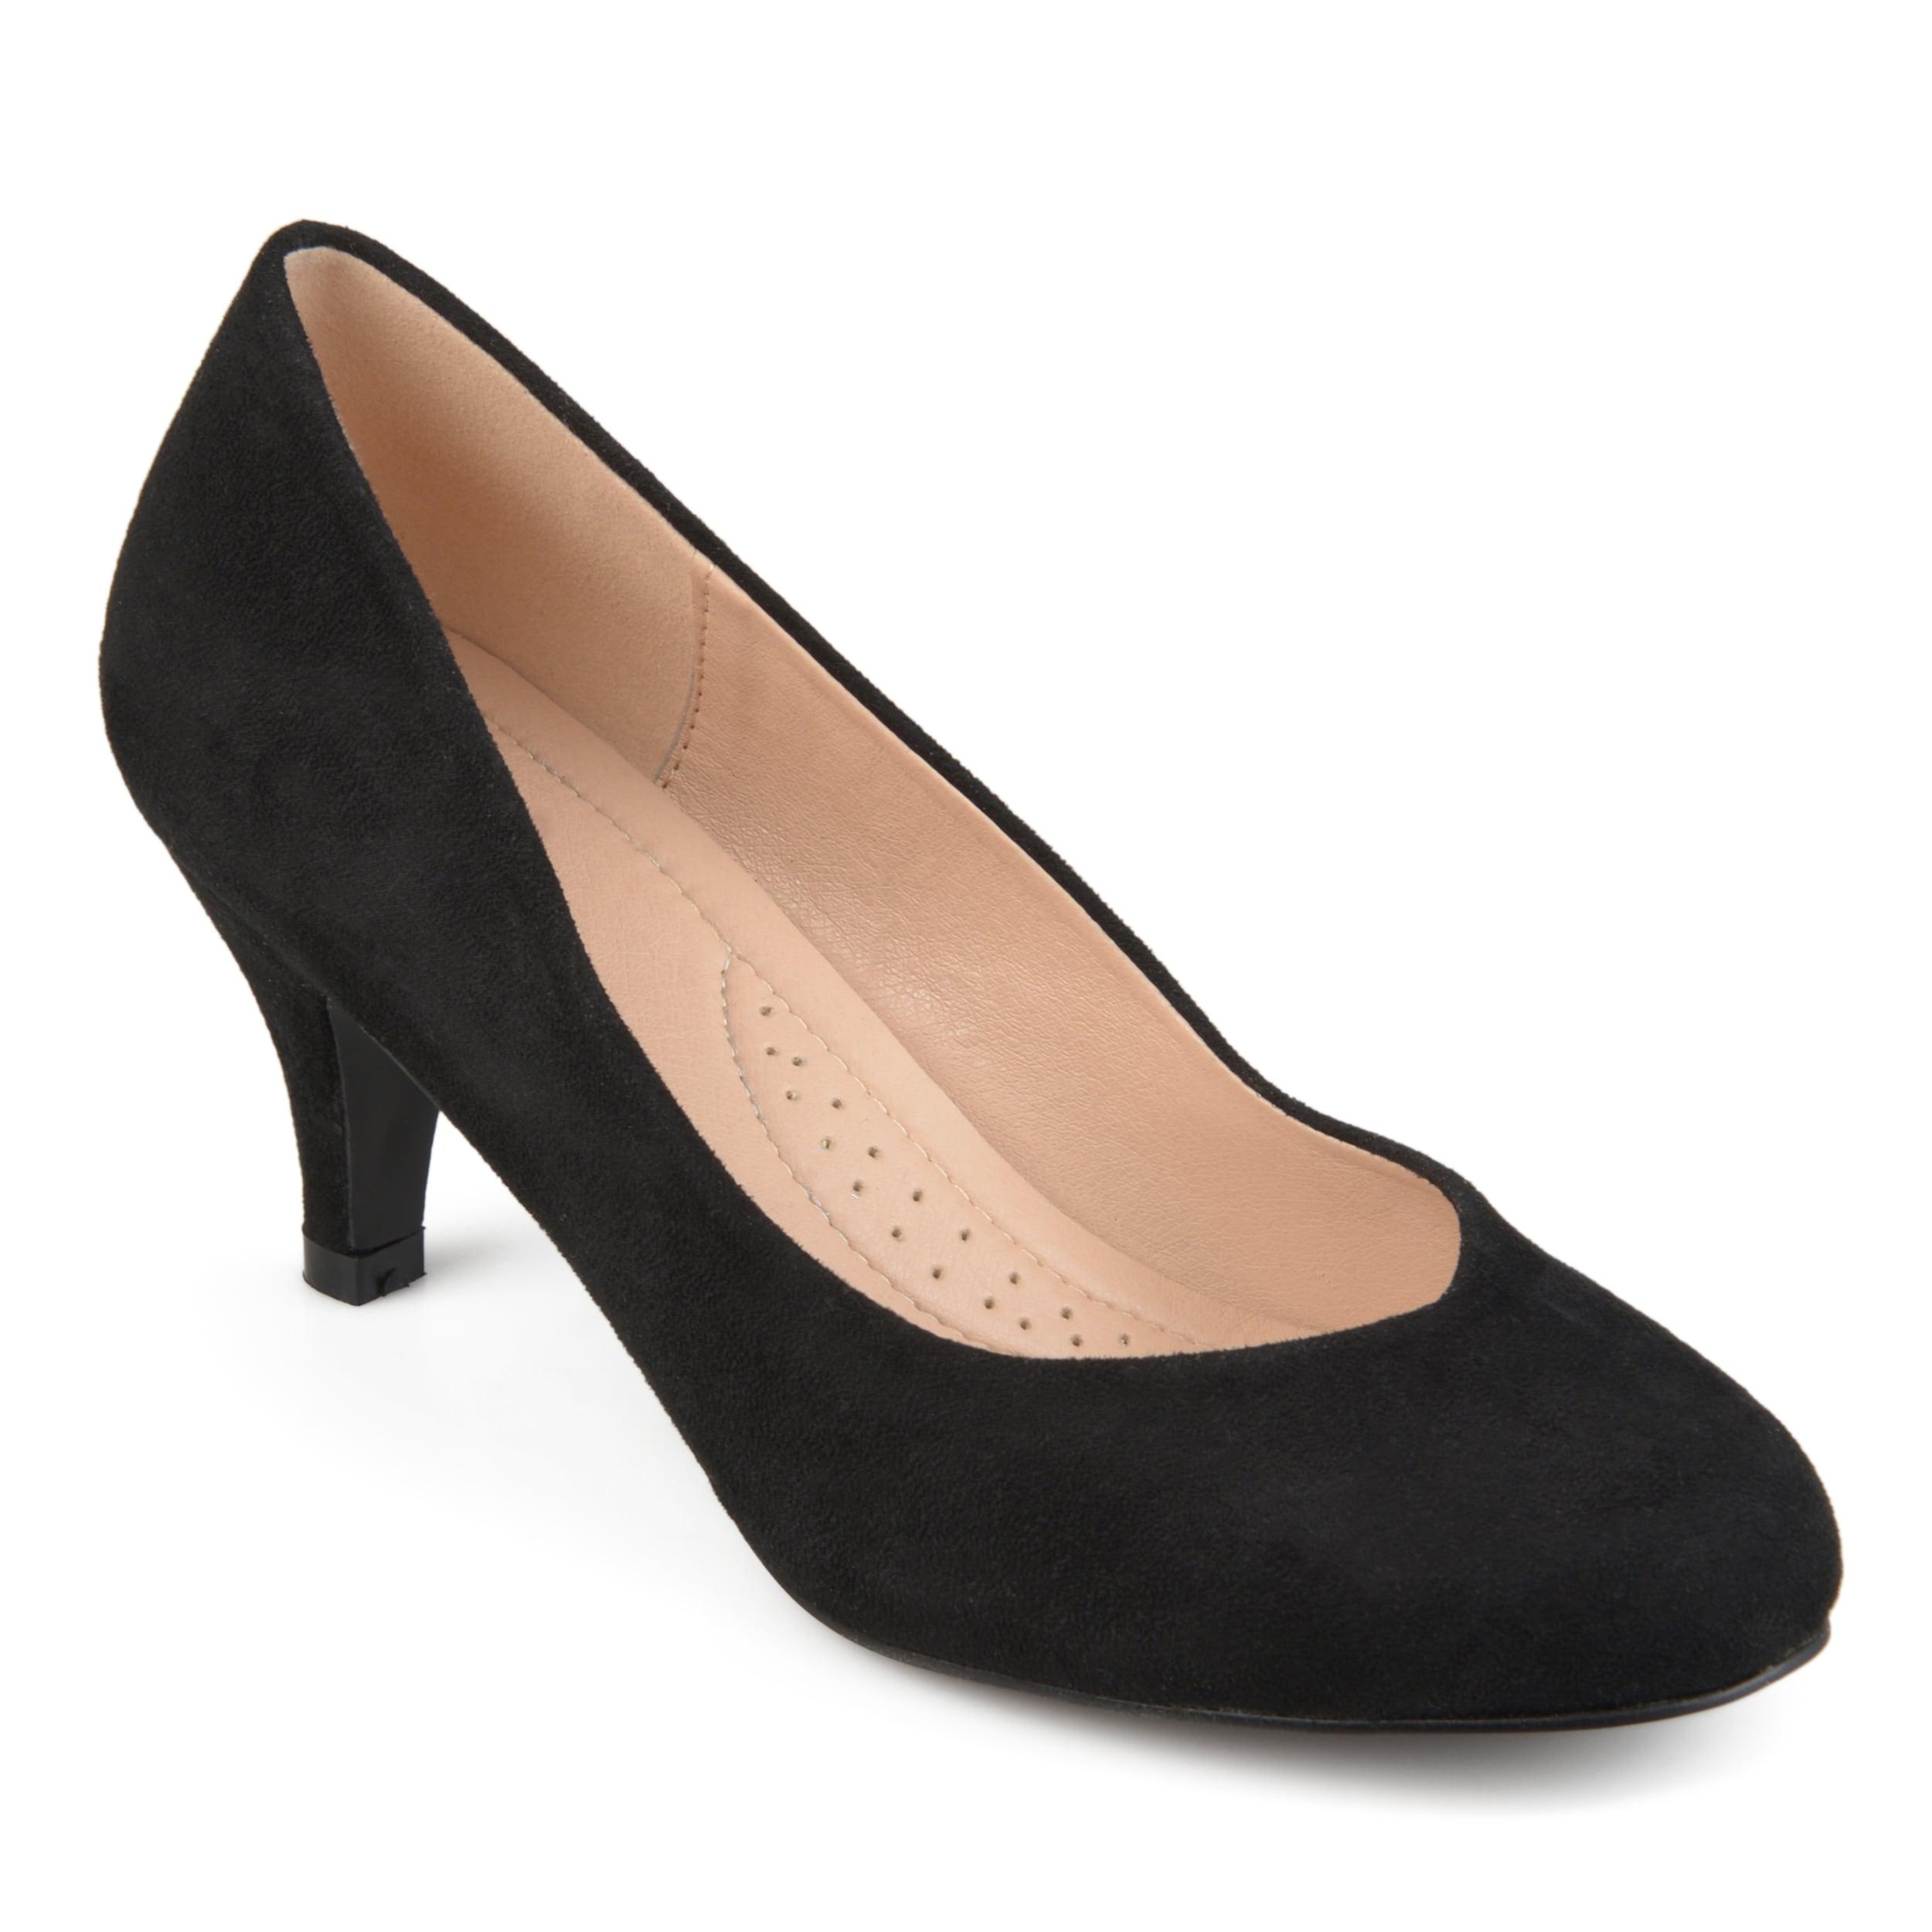 comfort comforter heels wedge orthotic worldwide elaine aetrex main jane mary black